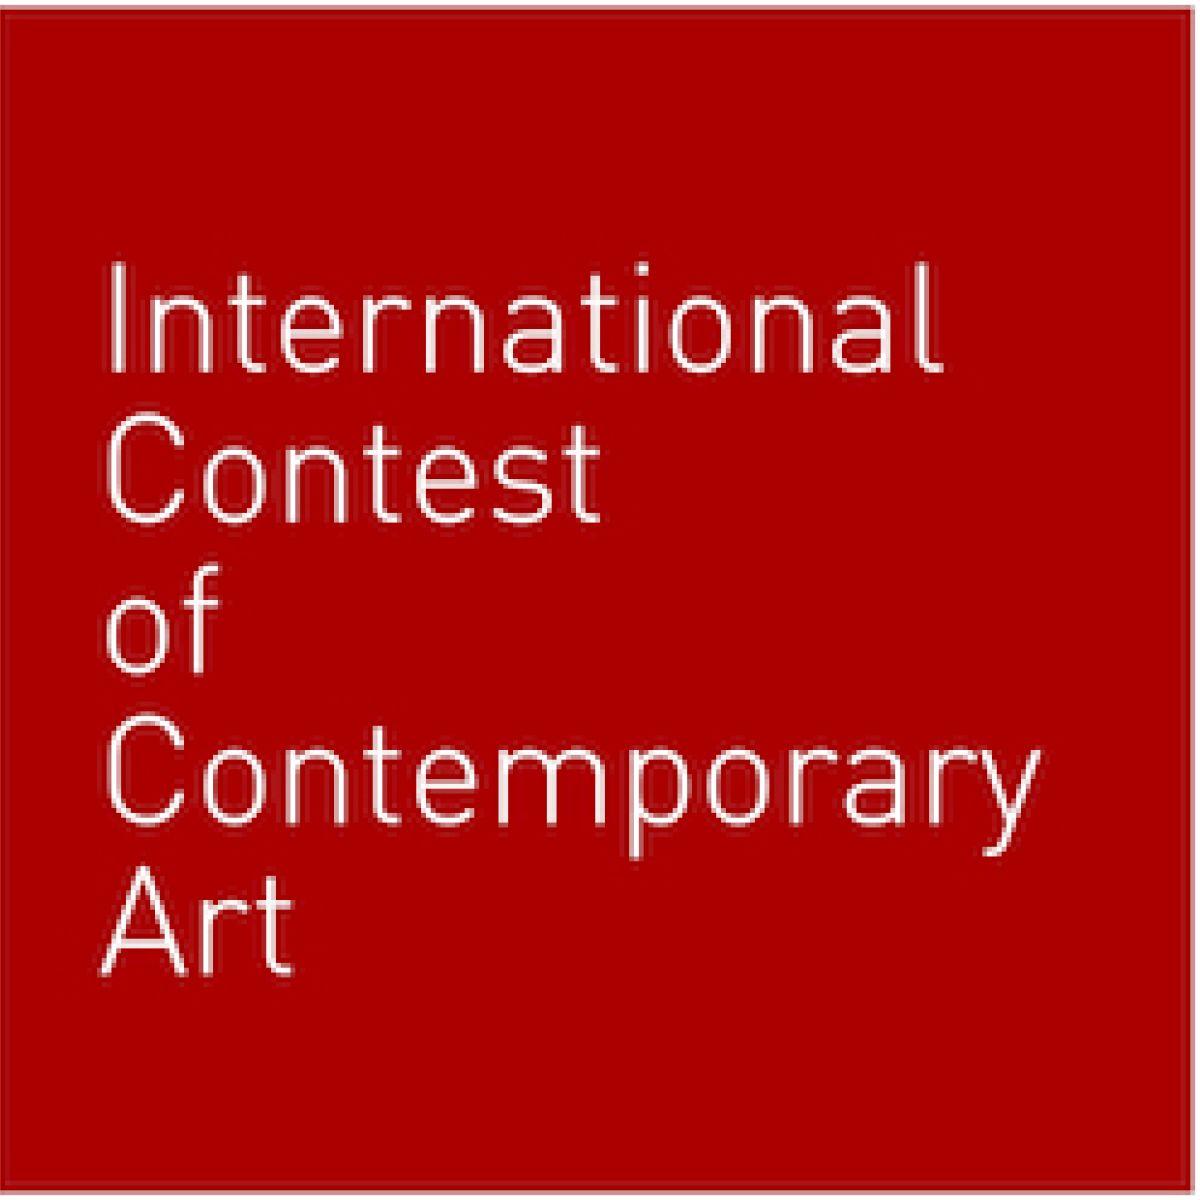 YICCA International Contest of Contemporary Art 16/17